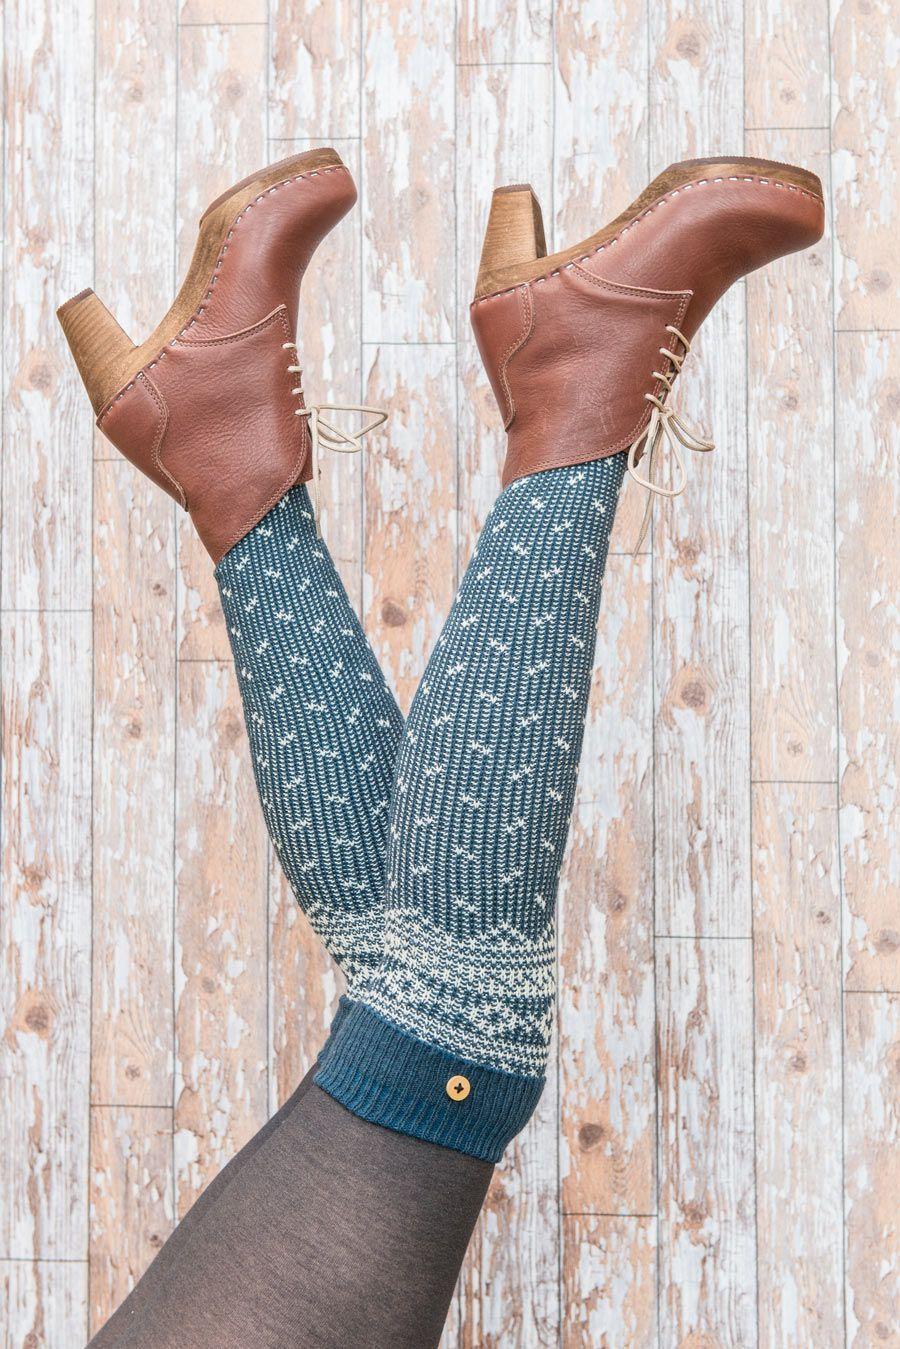 Powder Icelandic Socks in Teal